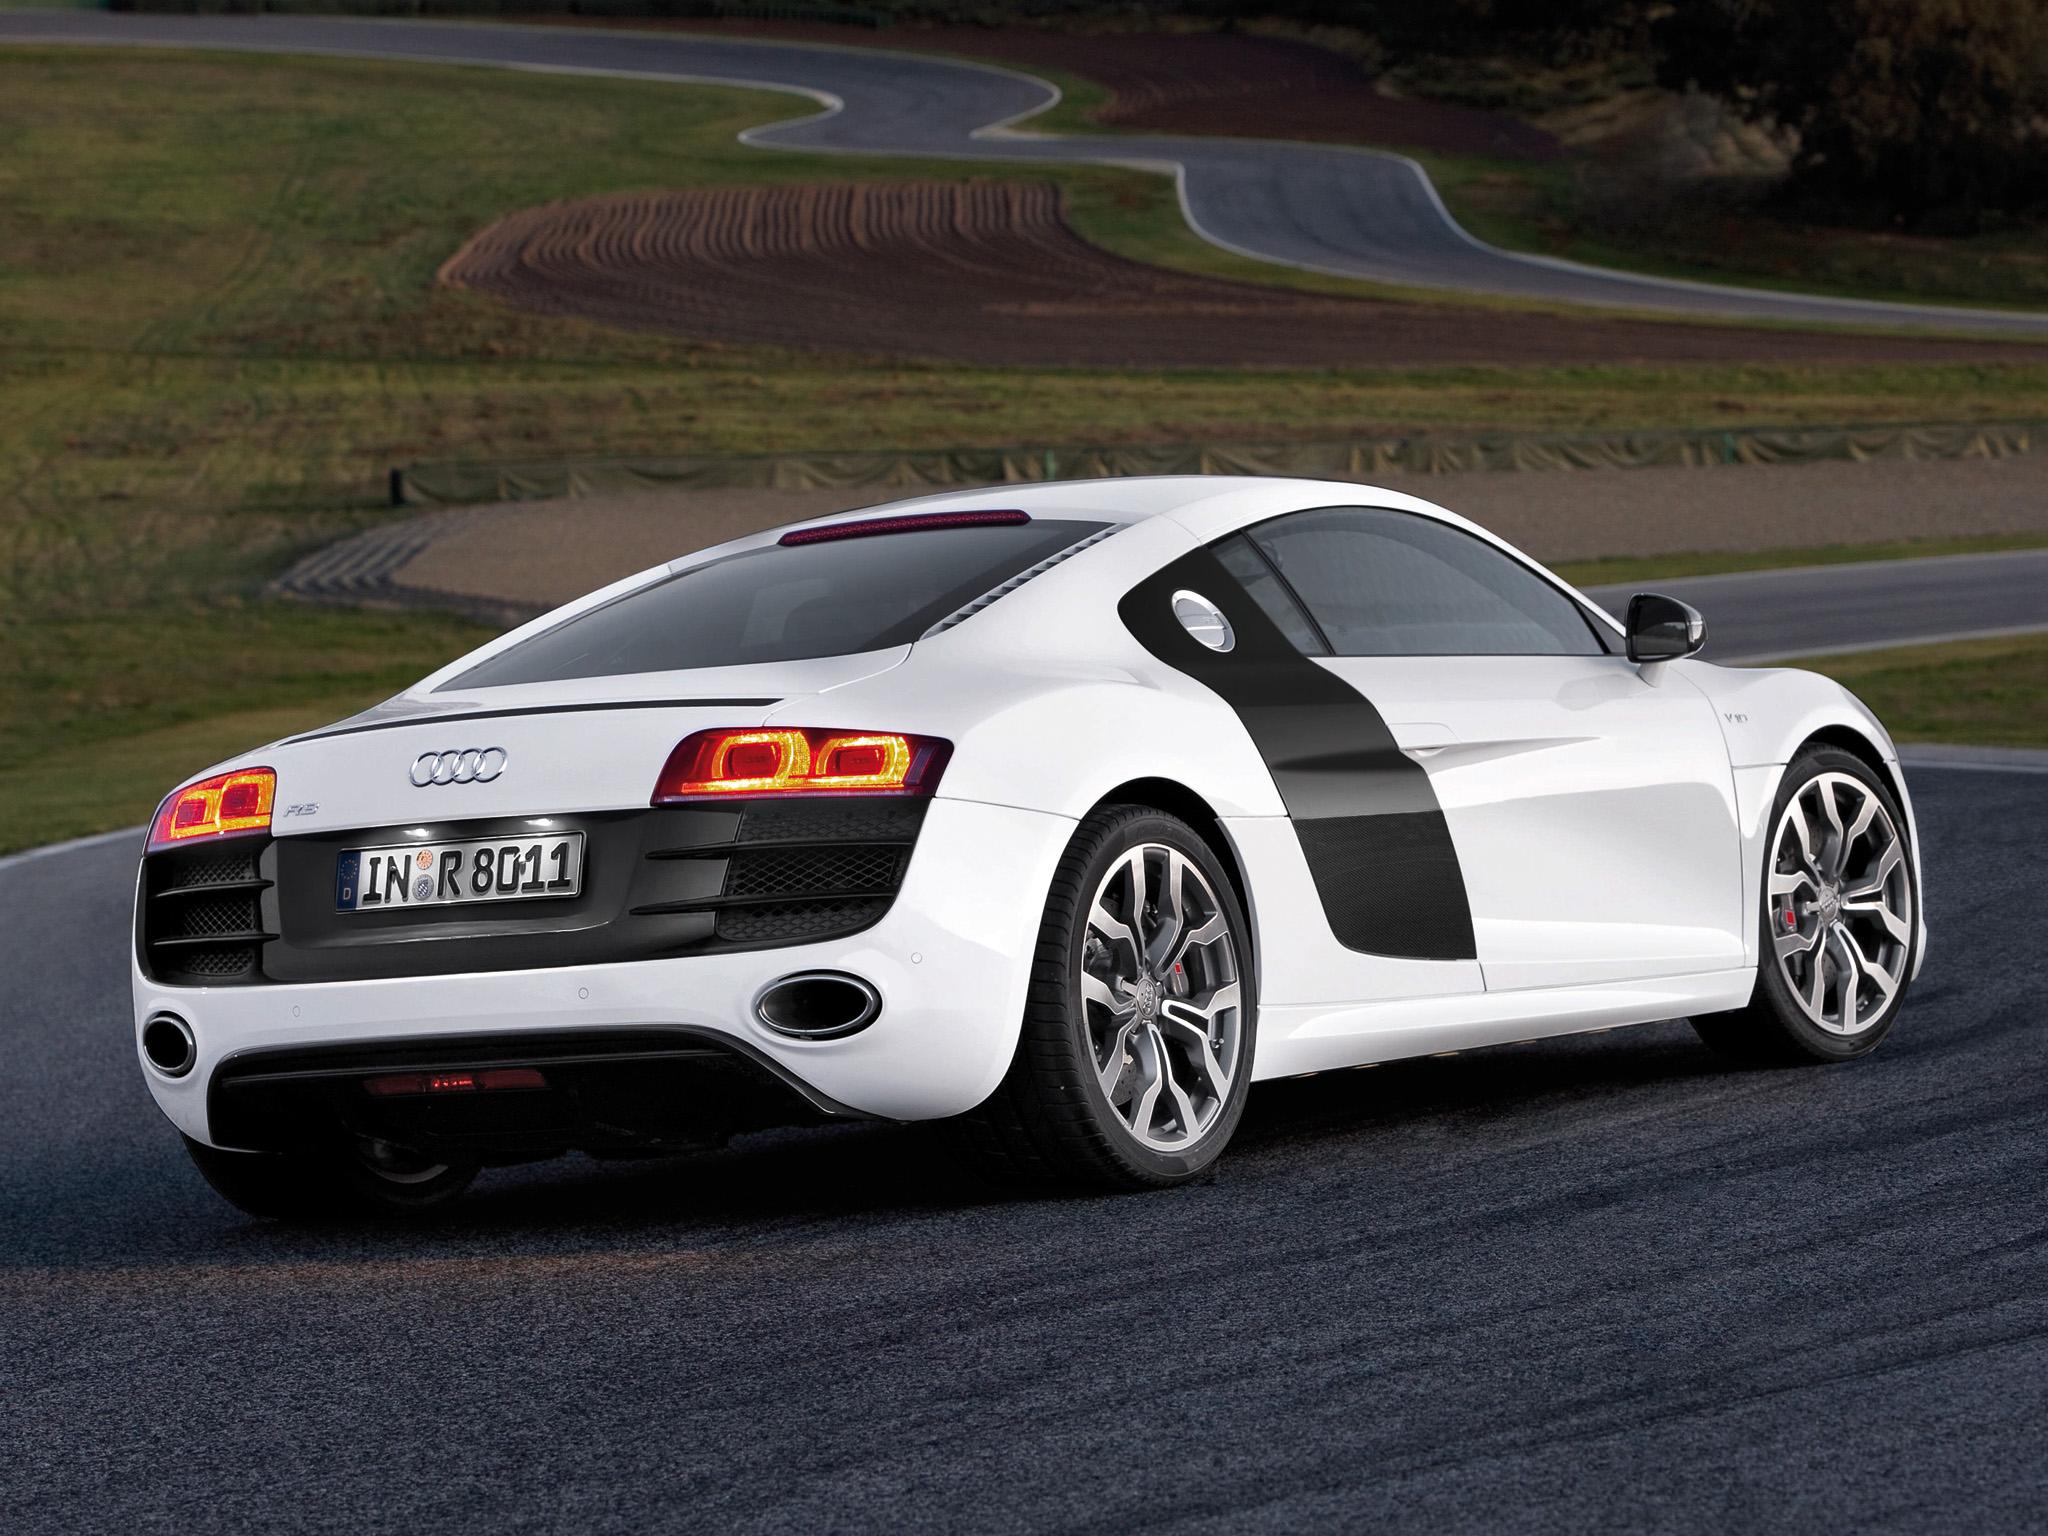 Audi R8 V10 wallpaper 1 2048x1536